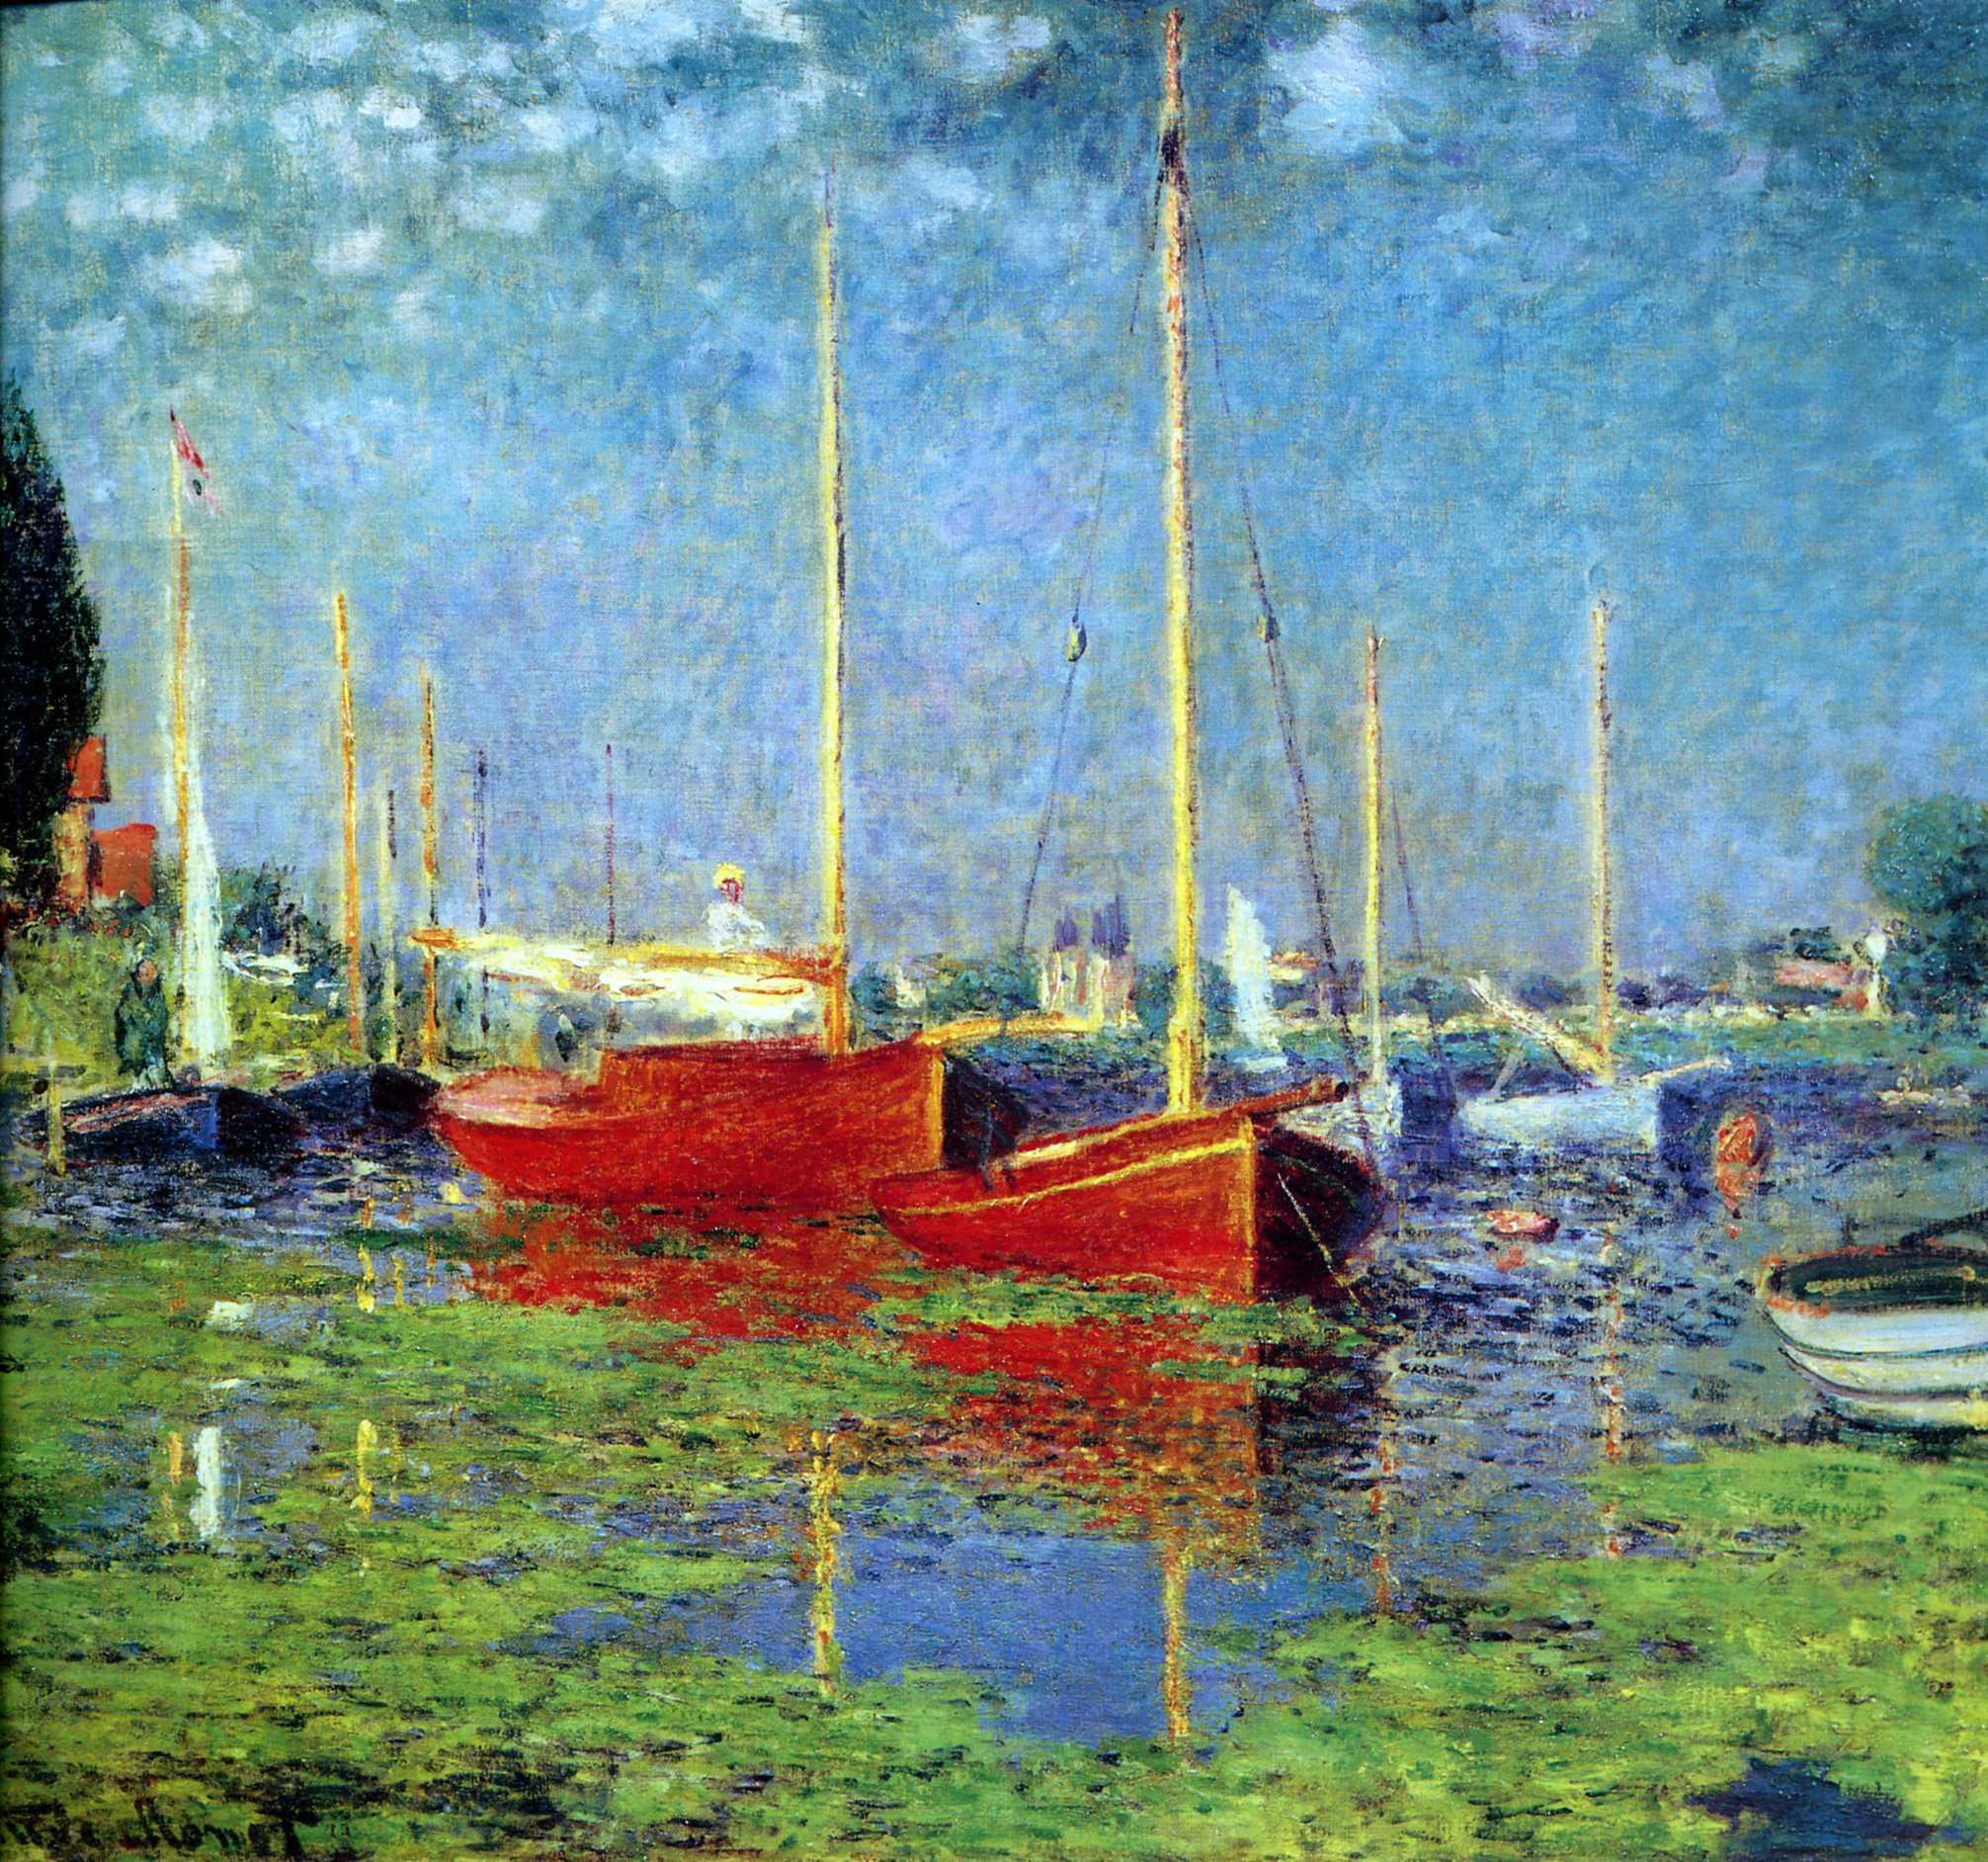 пейзажи - парусники и лодки < Прогулочные лодки в Аржантёе >:: Клод Моне, описание картины - Claude Monet фото